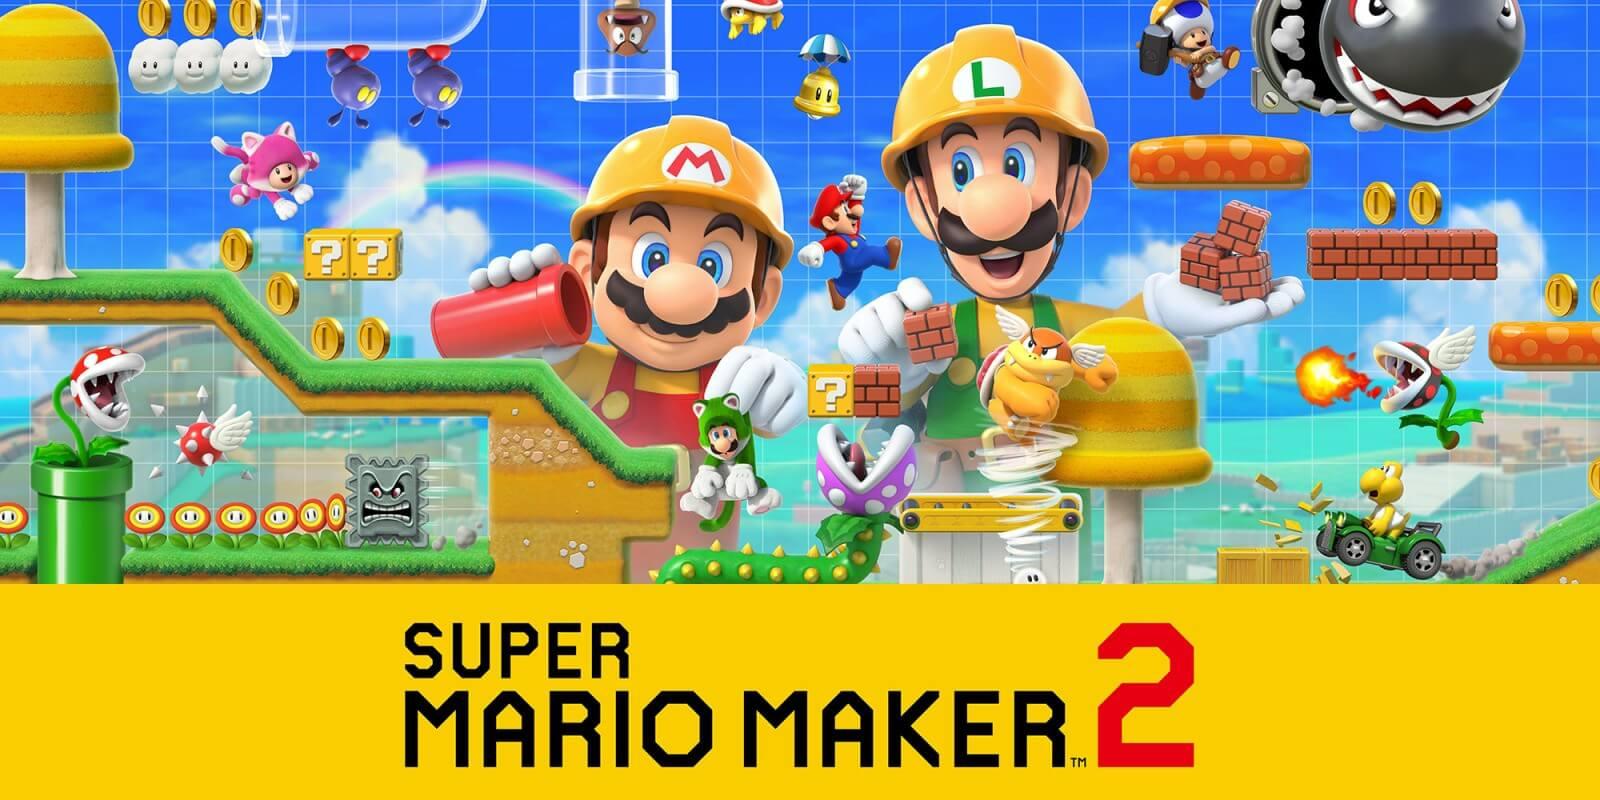 uper Mario Maker 2 background